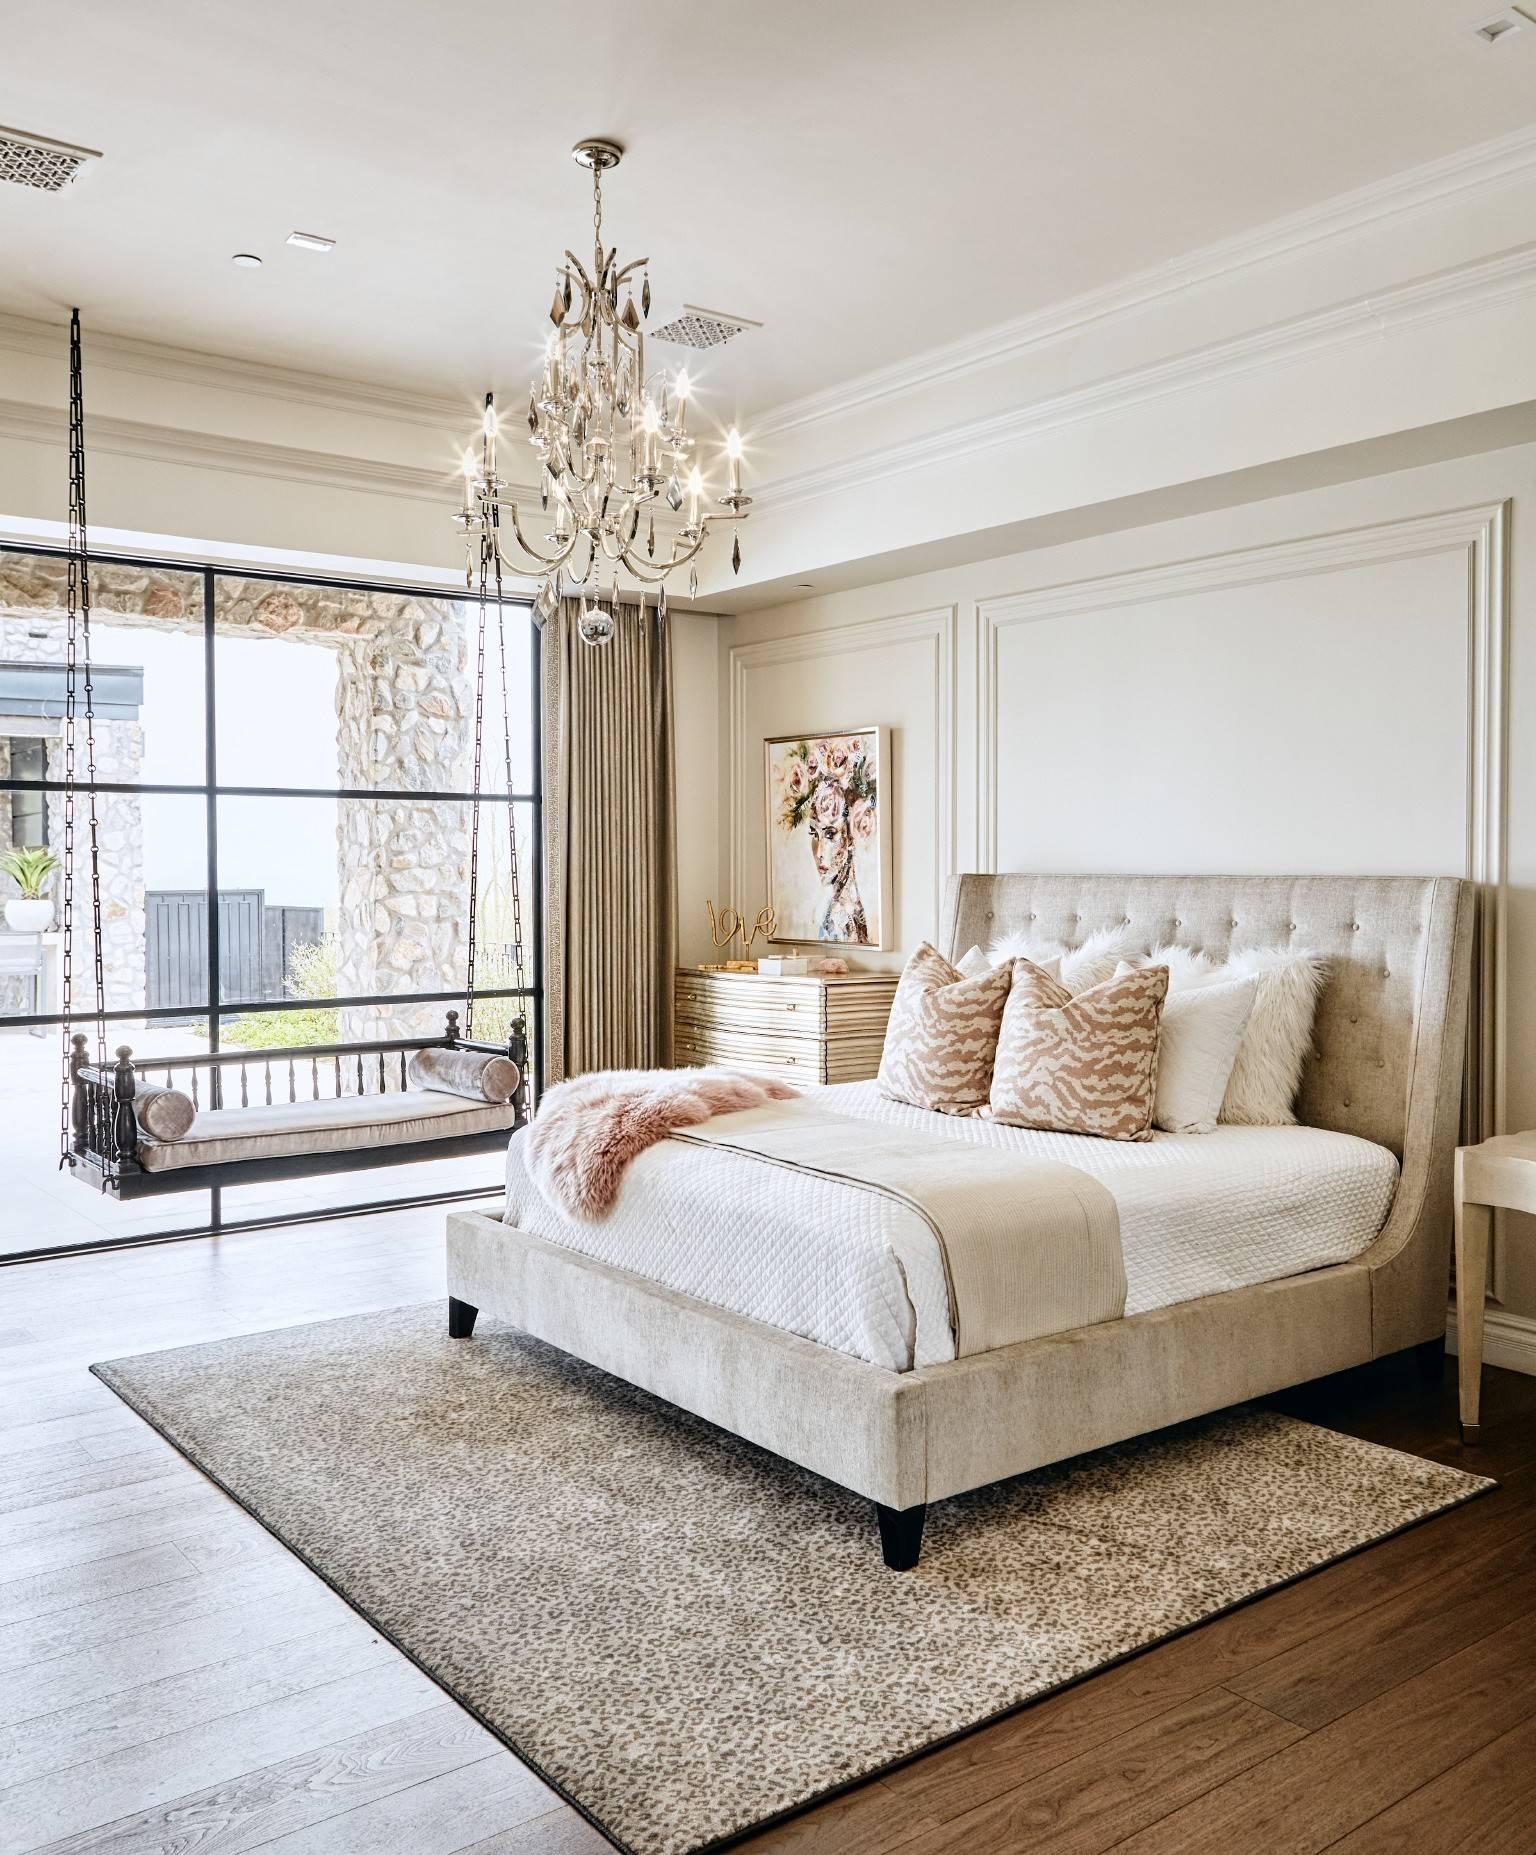 75 beautiful beige bedroom pictures & ideas - july, 2020 | houzz